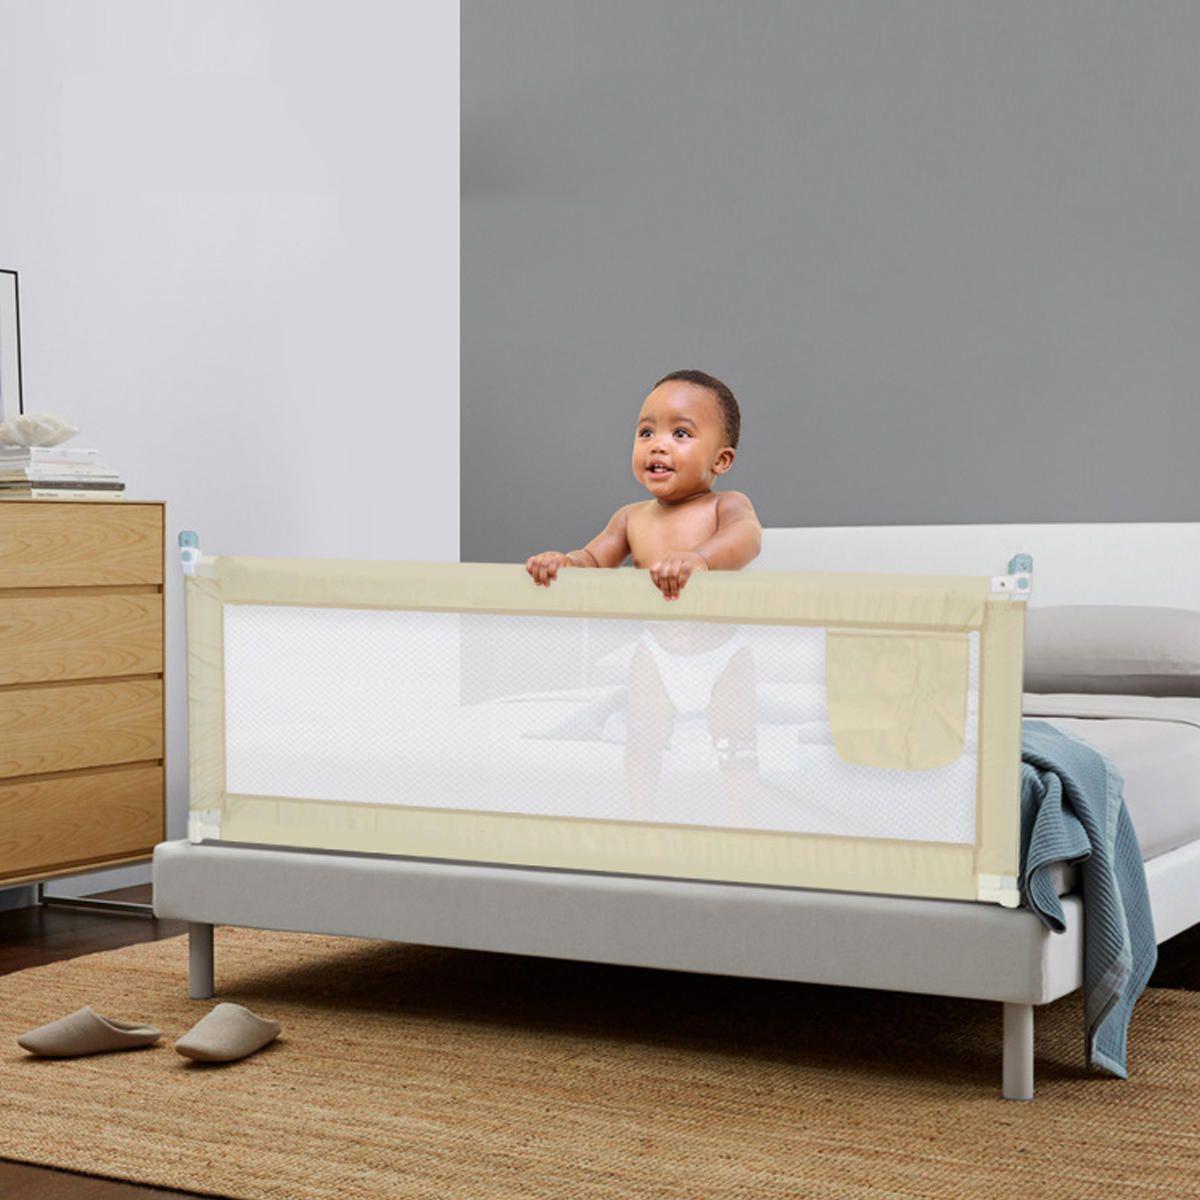 Baby guard bed rail toddler safety adjustable kids infant